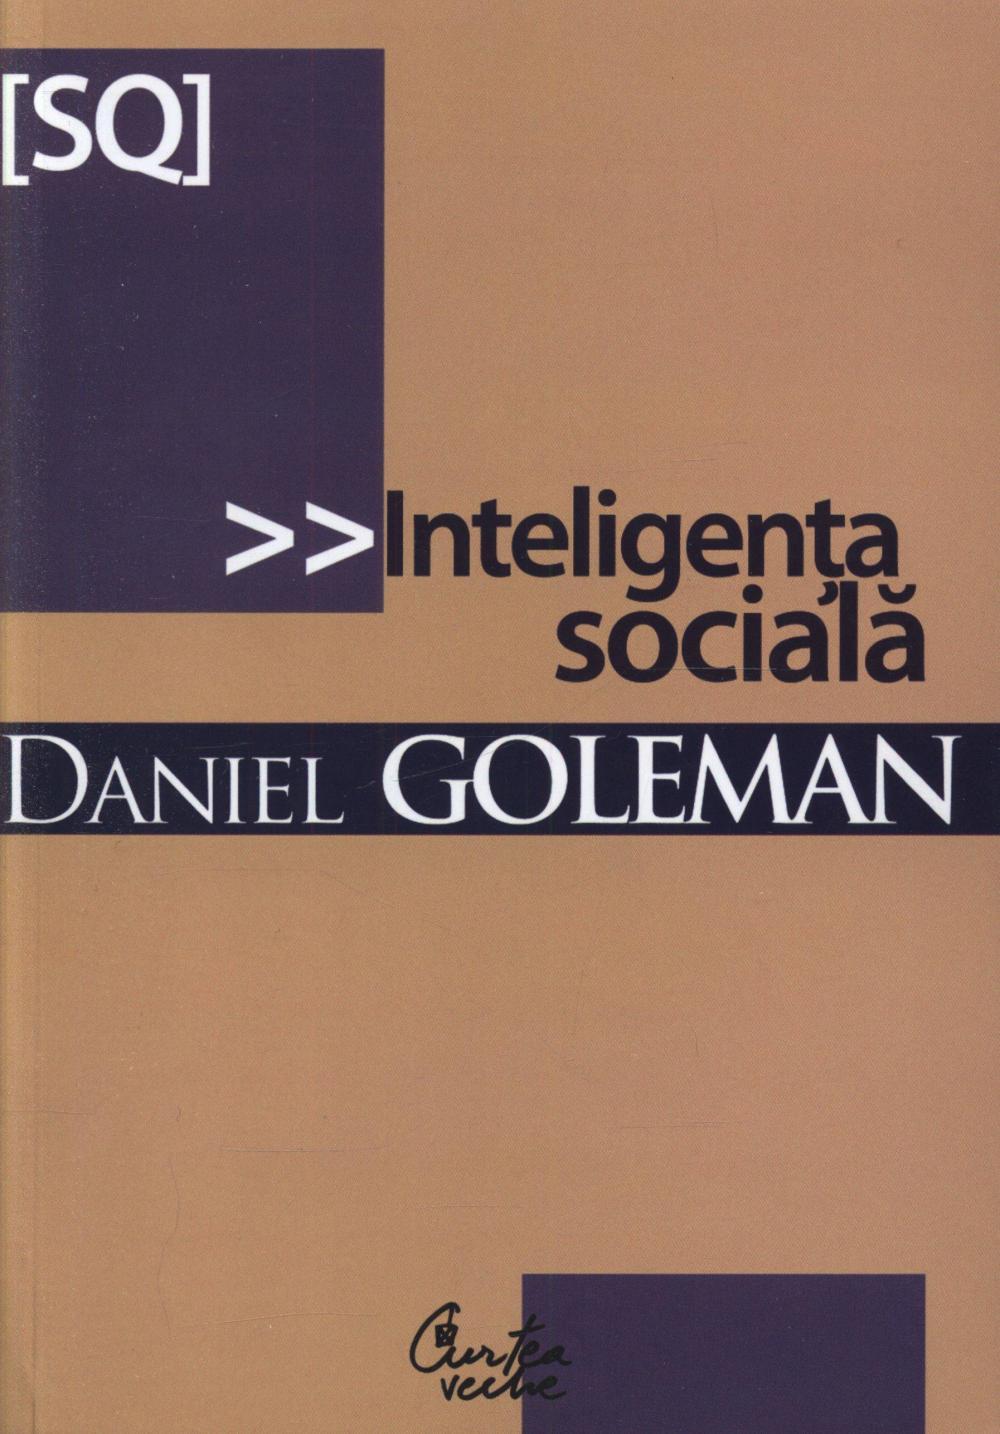 INTELIGENTA SOCIALA EDITIA II